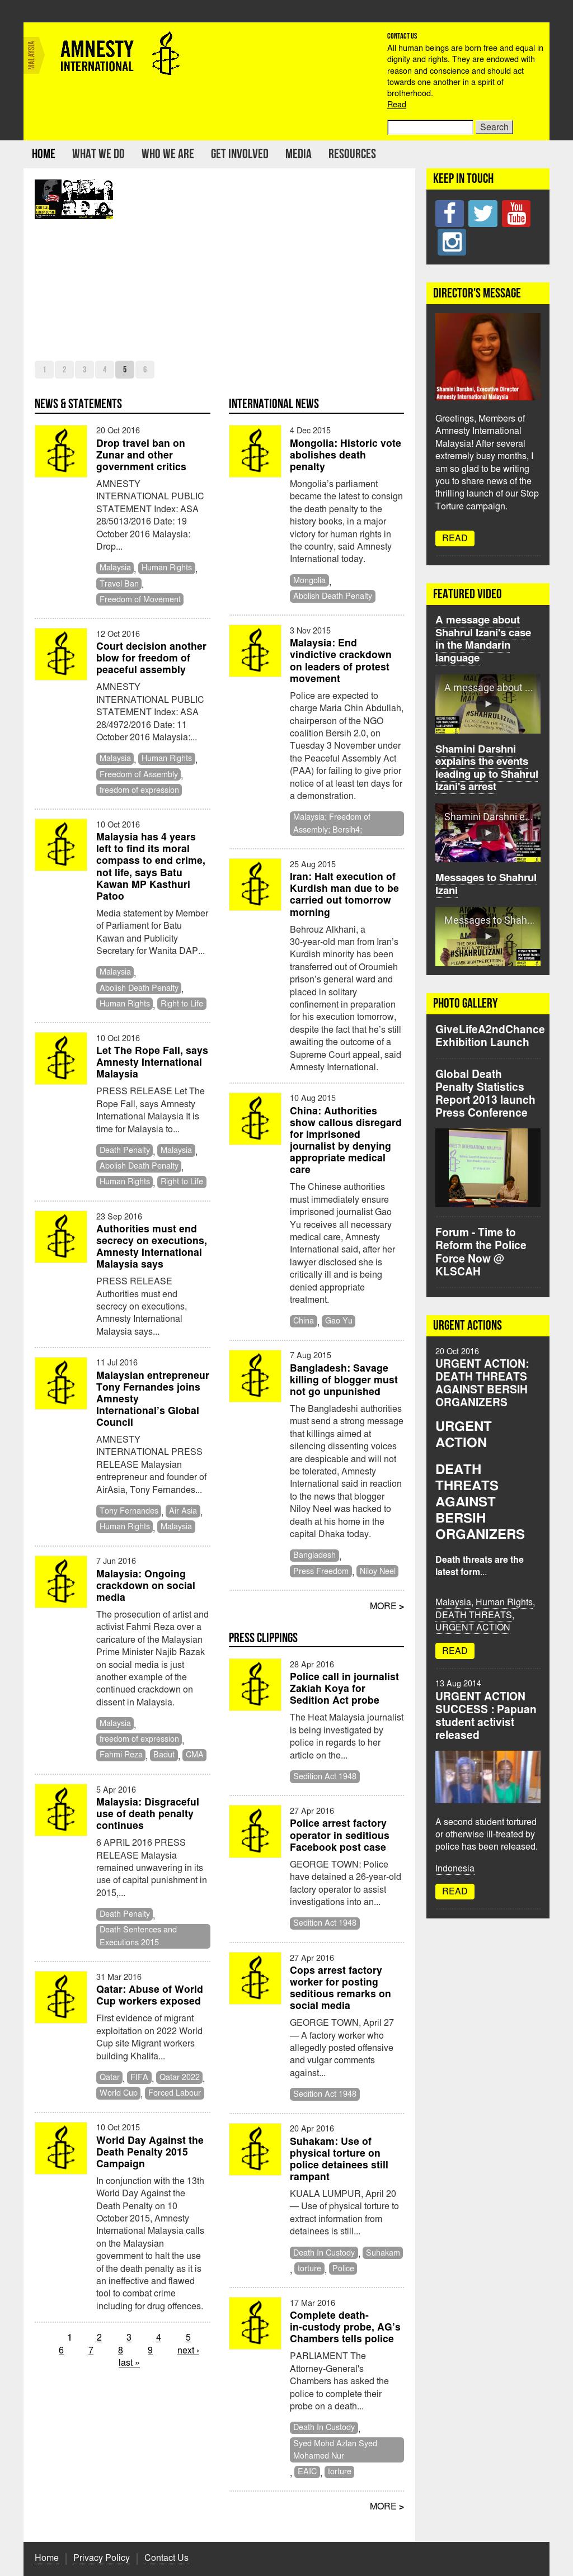 Amnesty International Malaysia Competitors, Revenue and